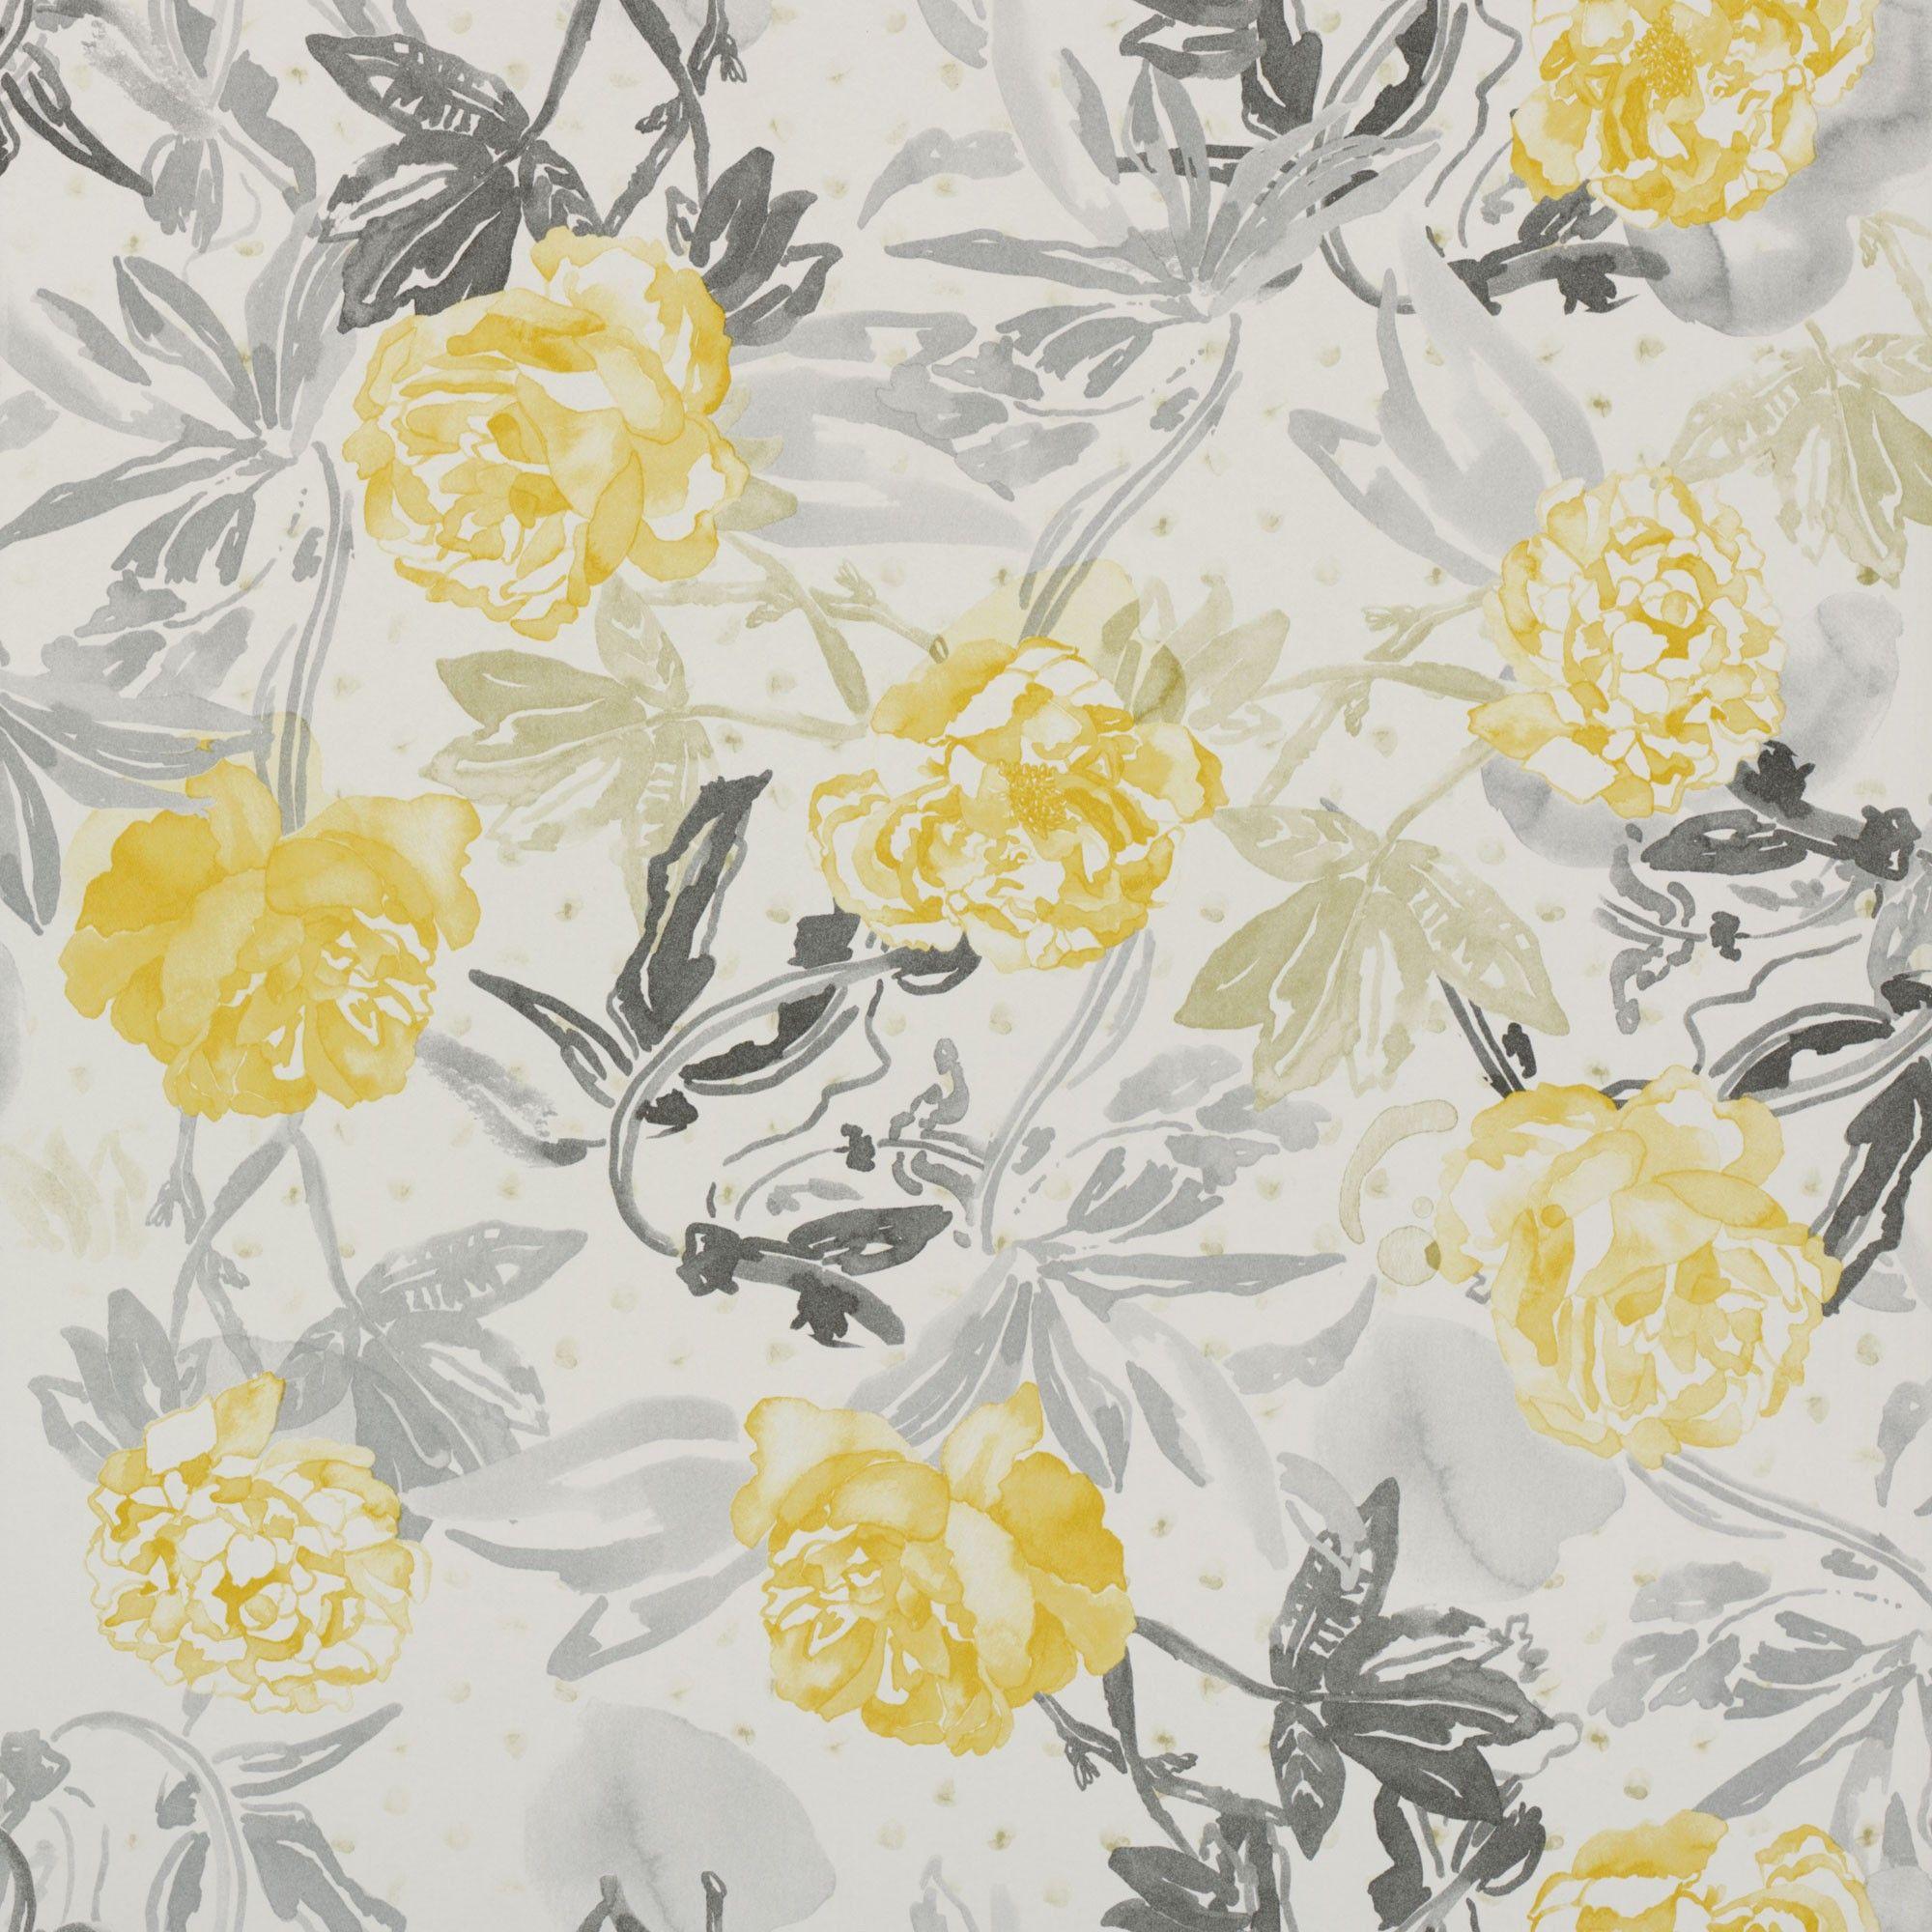 Roses Watercolour Golden Yellow And Grey Wallpaper Pinterest